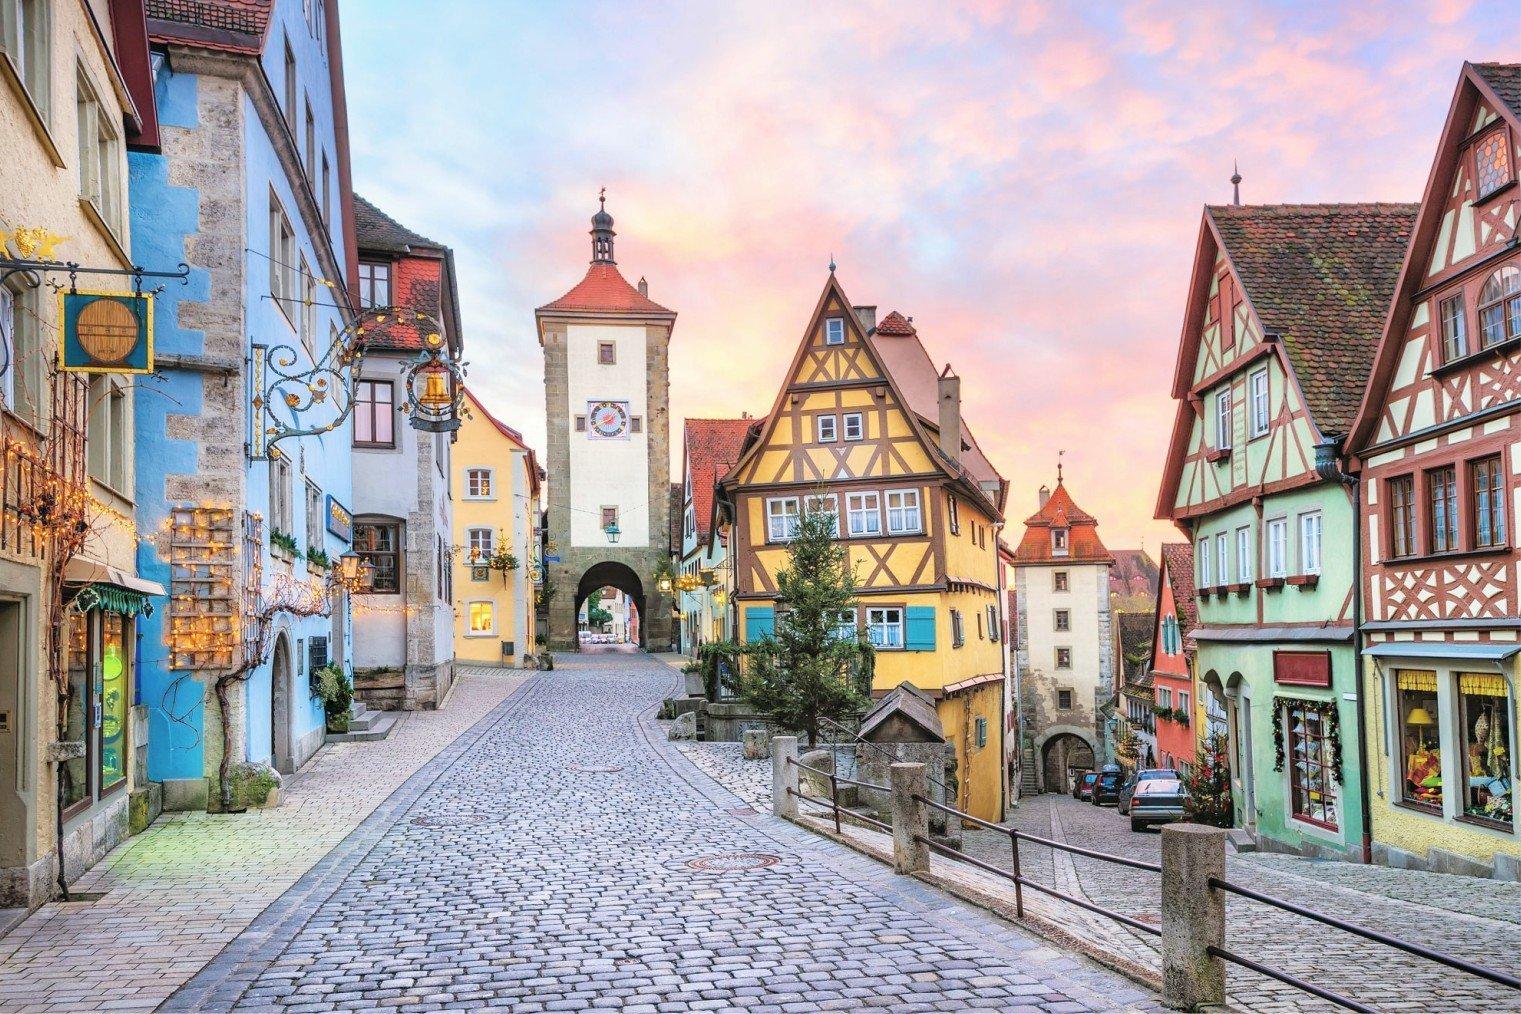 Ротенбург на Таубере, Германия. Туризм, информация. Rothenburg ob der Tauber, Germany